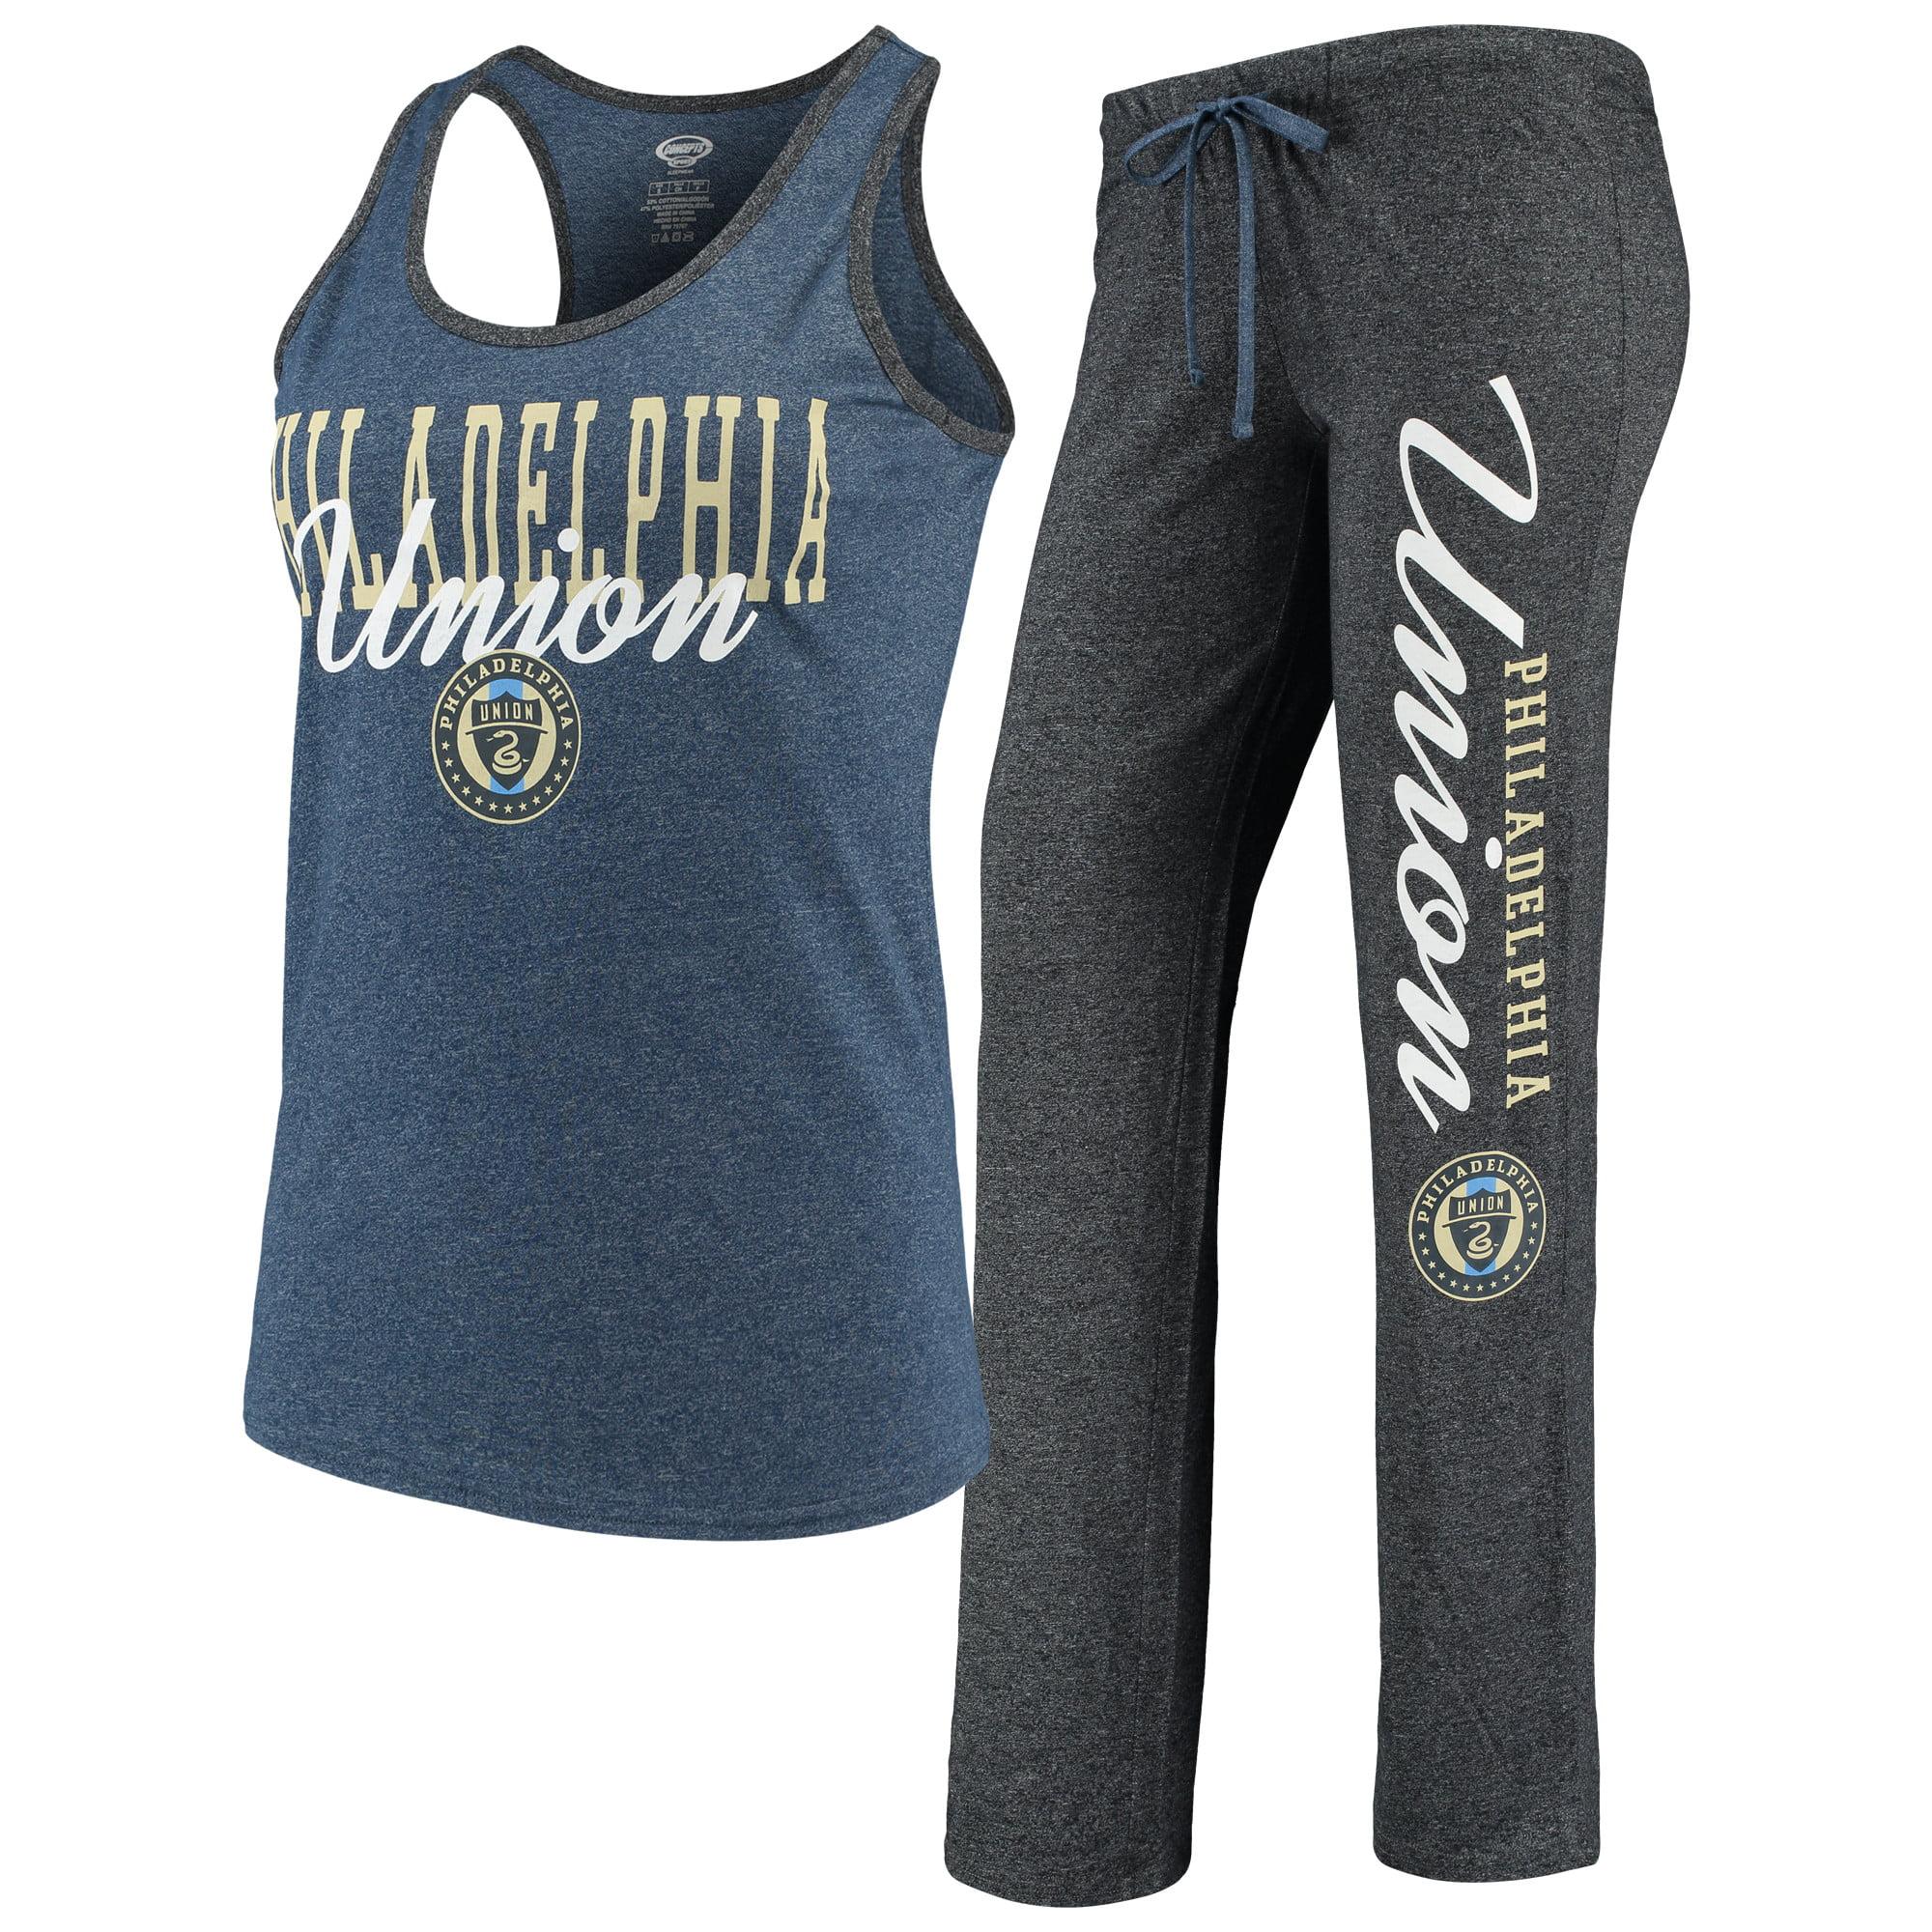 Philadelphia Union Concepts Sport Women's Spar Tank Top & Pants Sleep Set - Heathered Navy/Heathered Charcoal